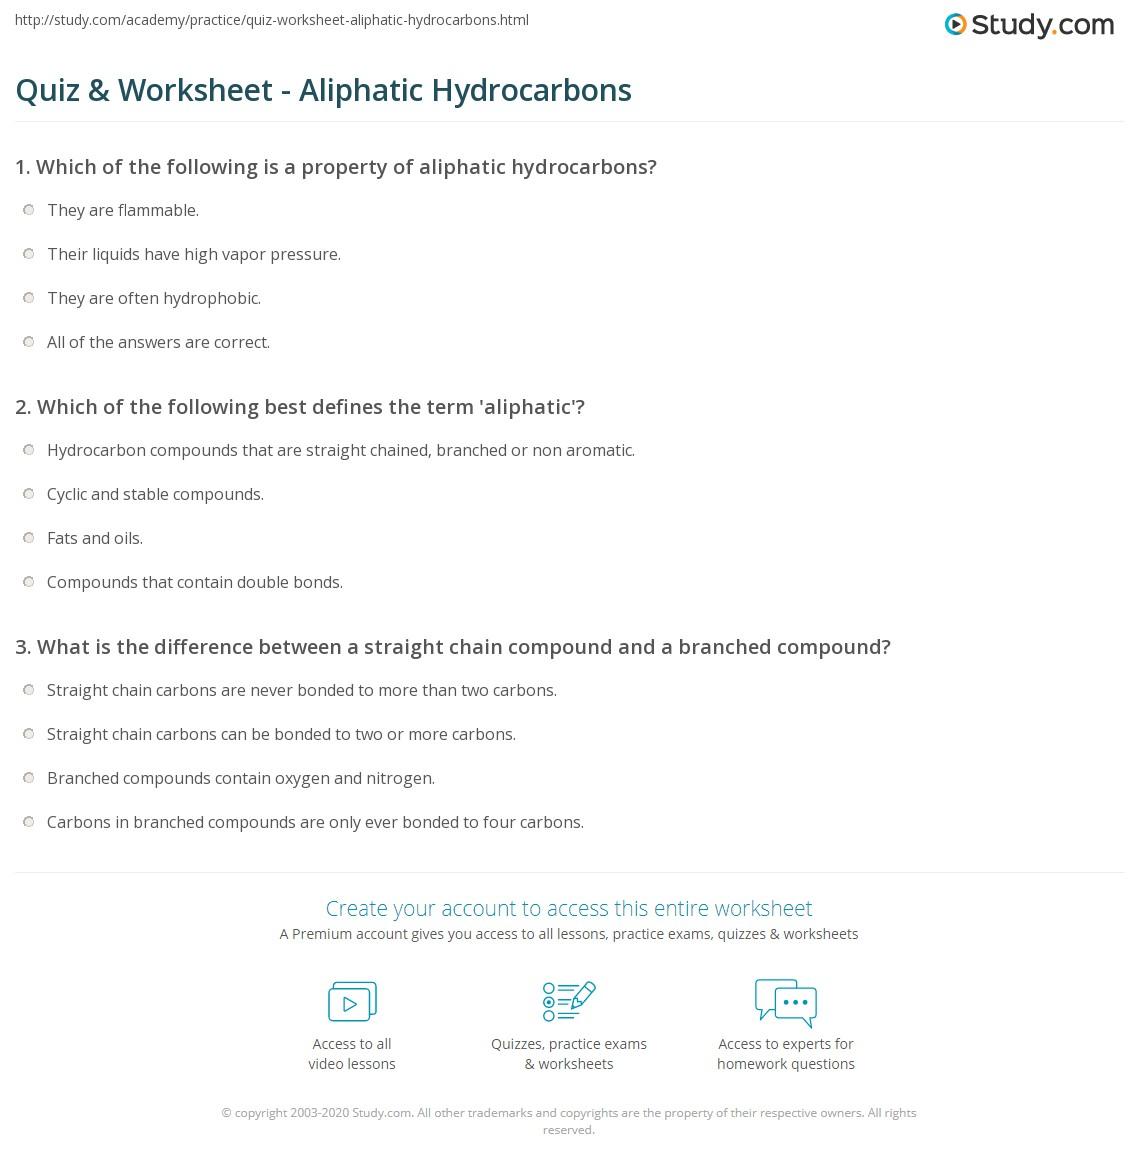 Quiz & Worksheet - Aliphatic Hydrocarbons   Study.com